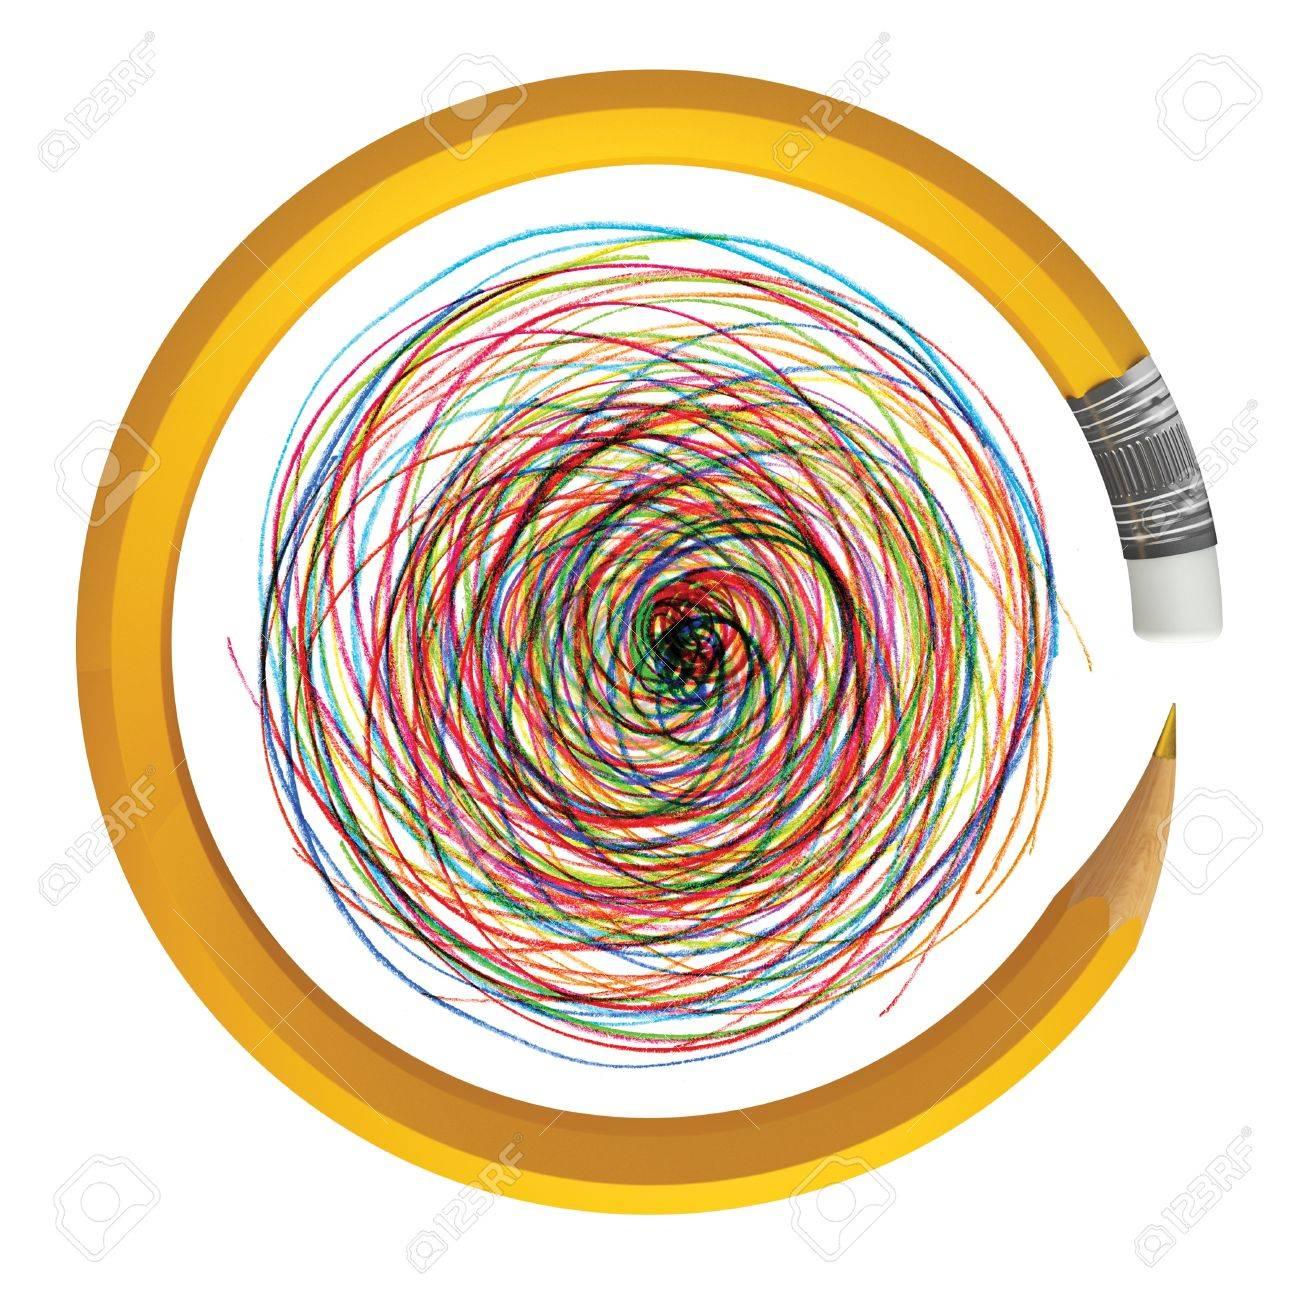 Pencil bent in a circle, 3d render Stock Photo - 11196343